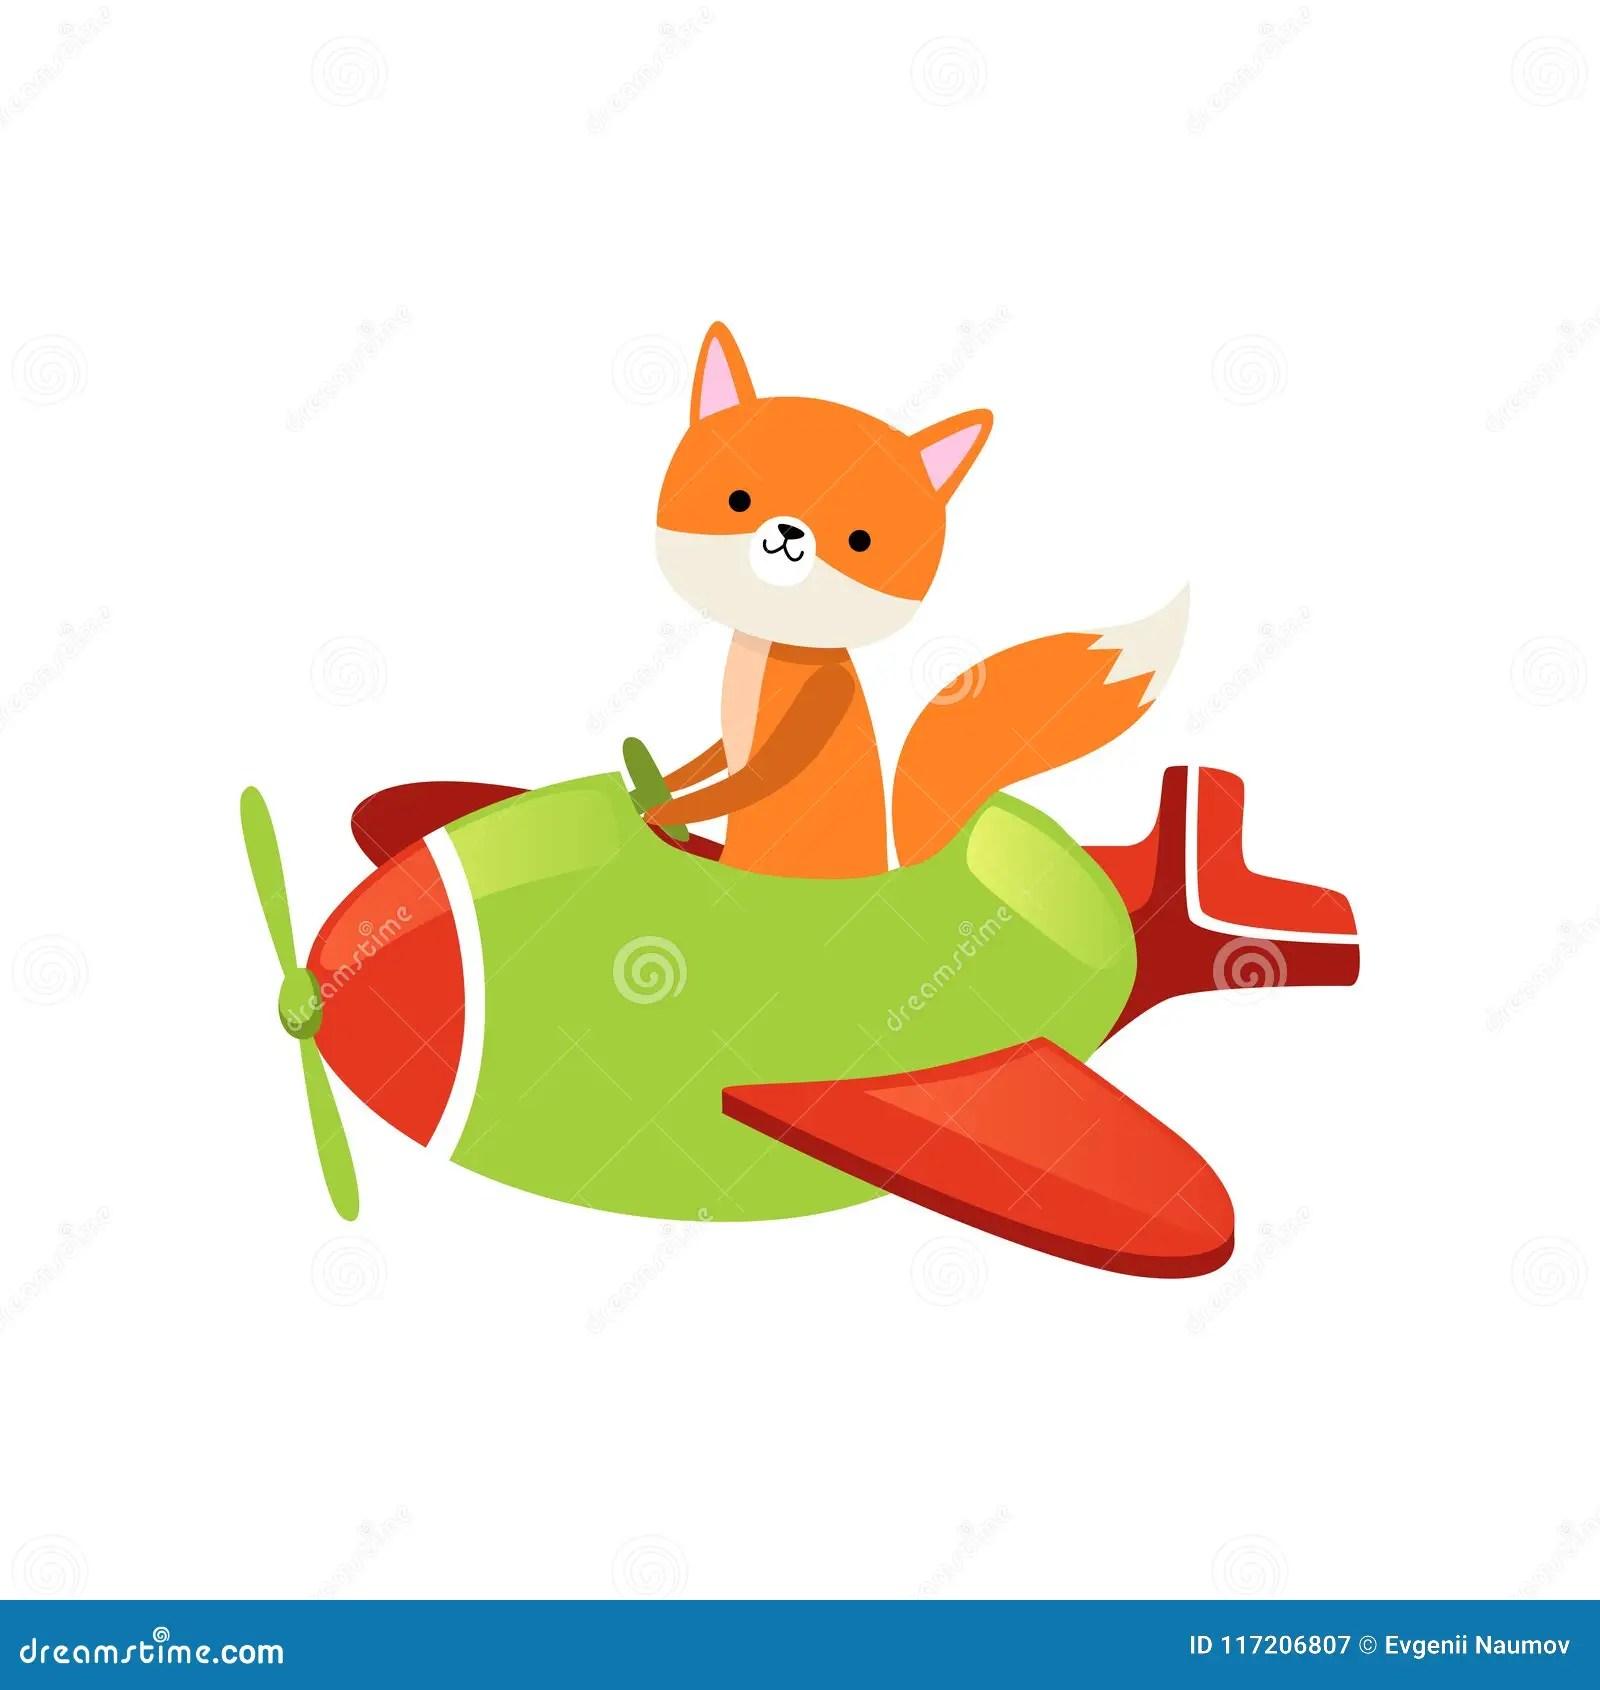 orange fox flying on